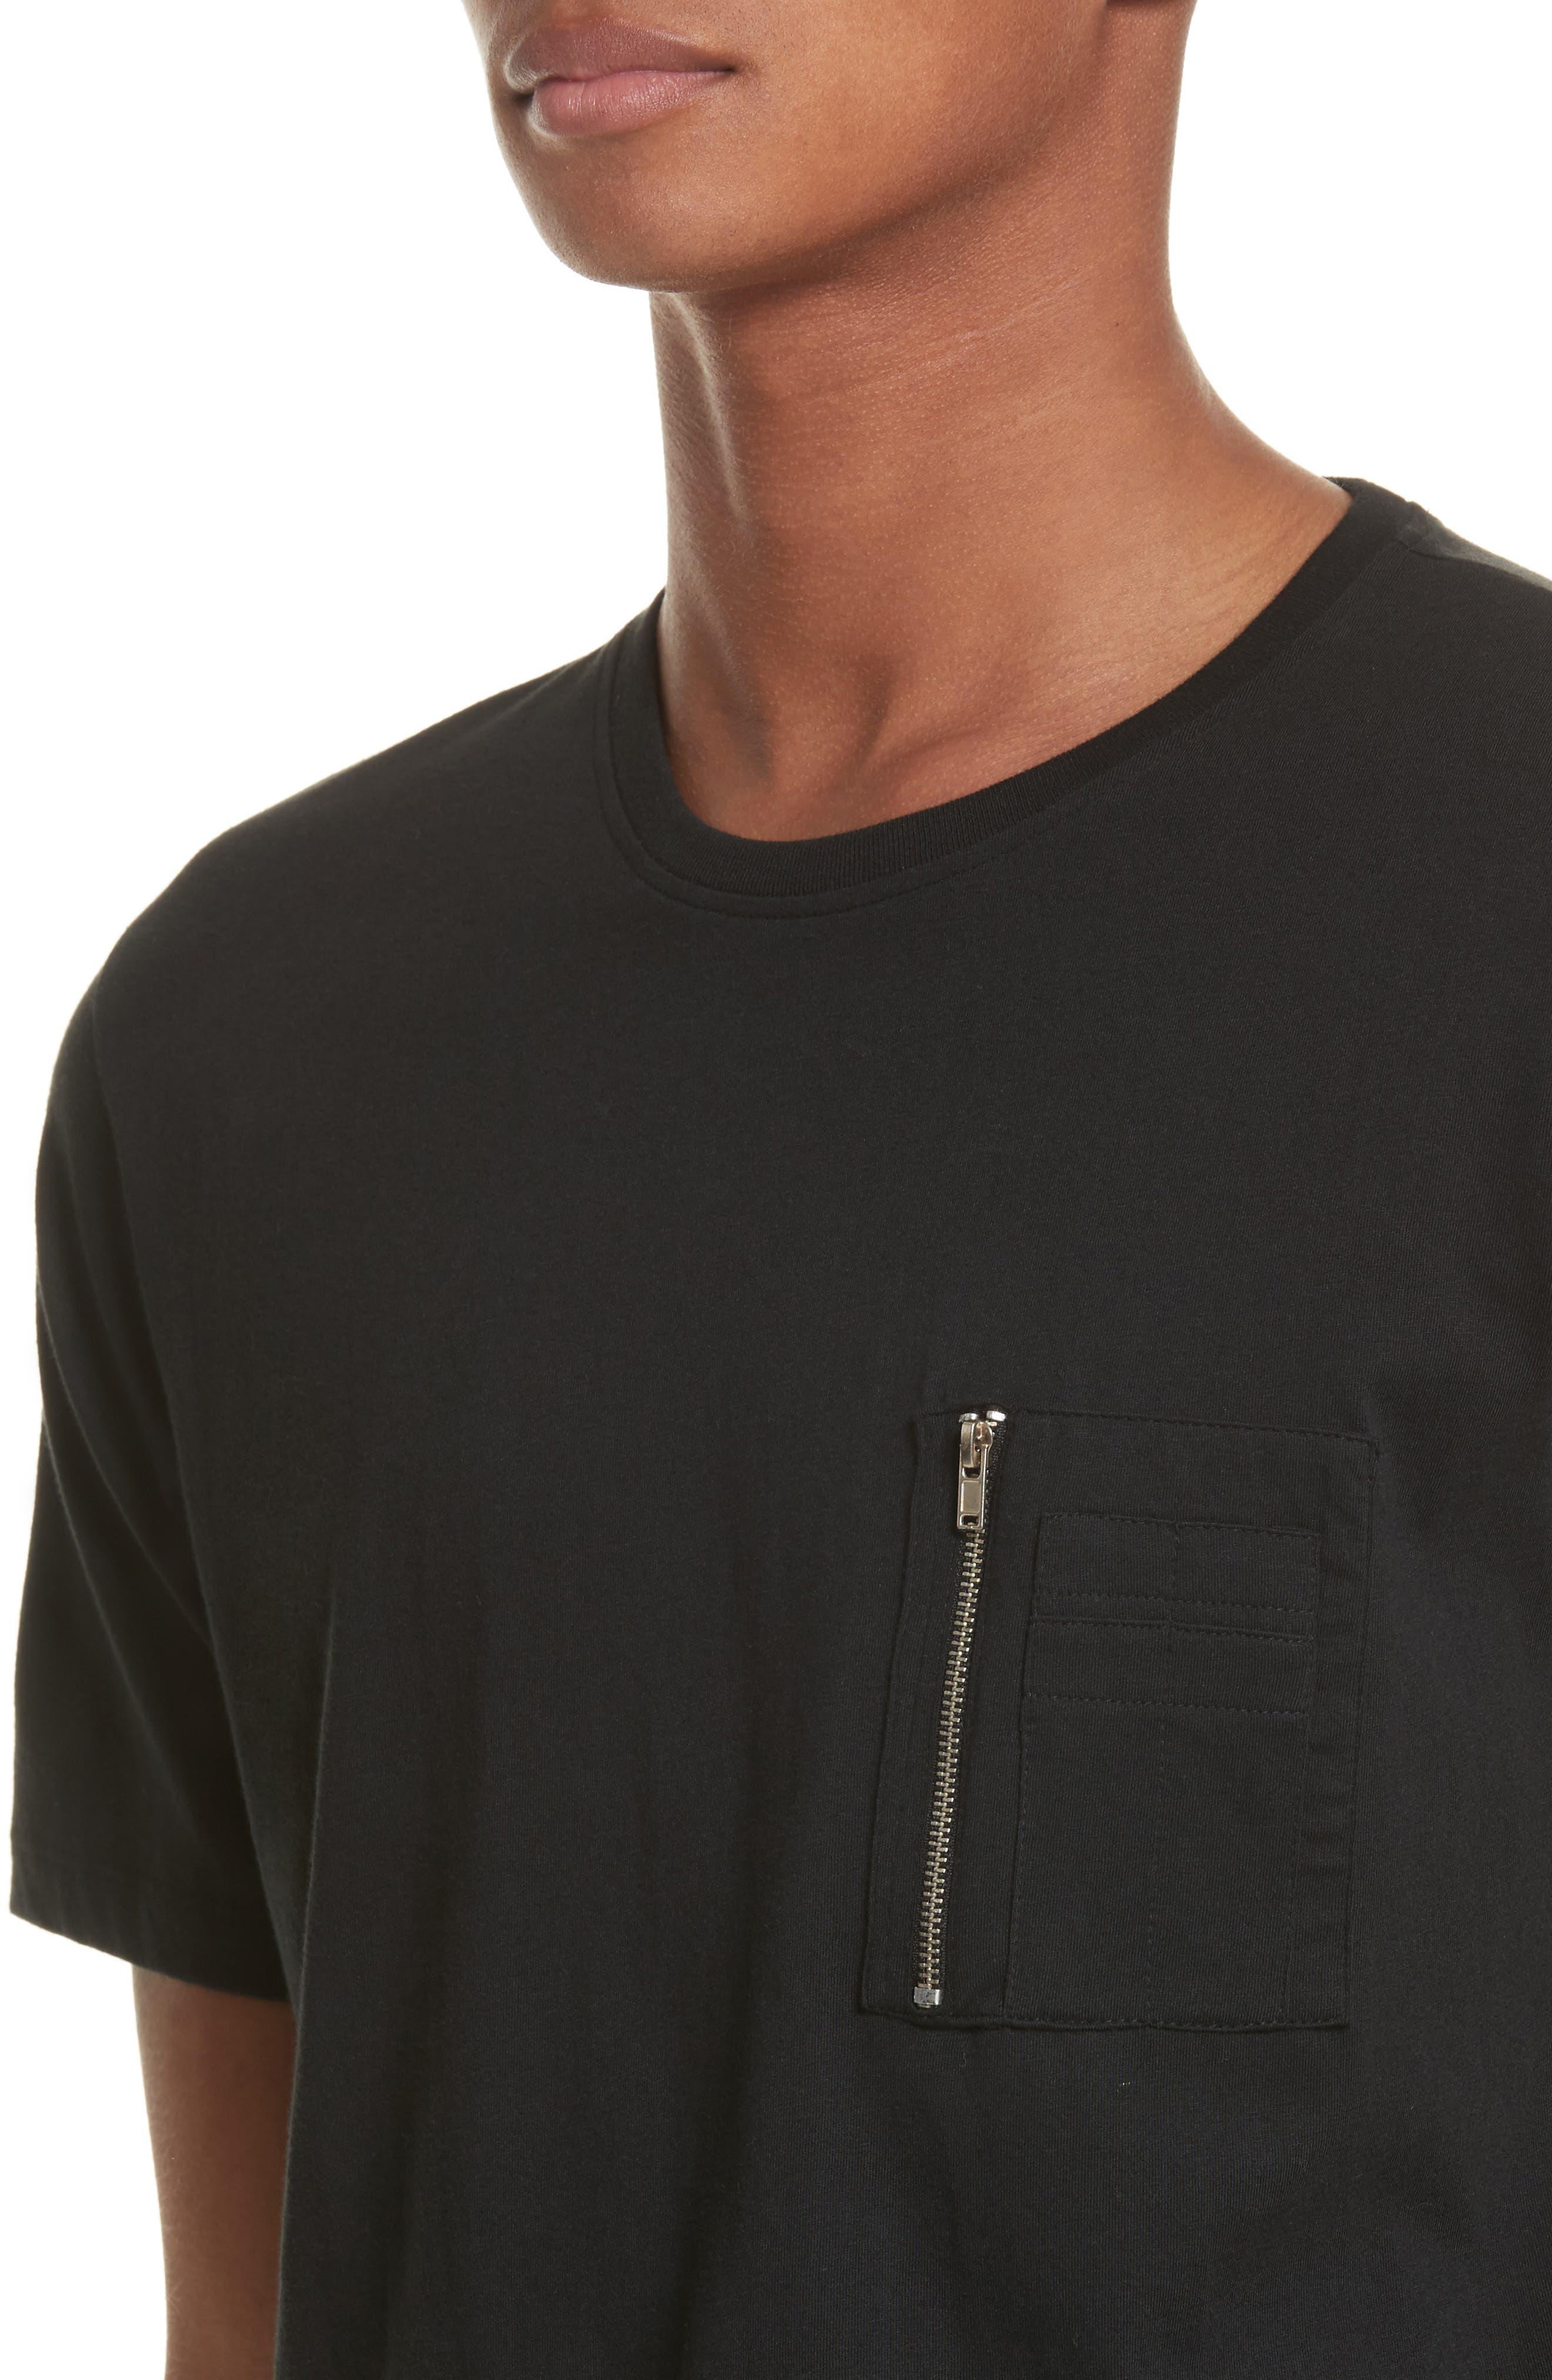 Zip Pocket T-Shirt,                             Alternate thumbnail 4, color,                             Black